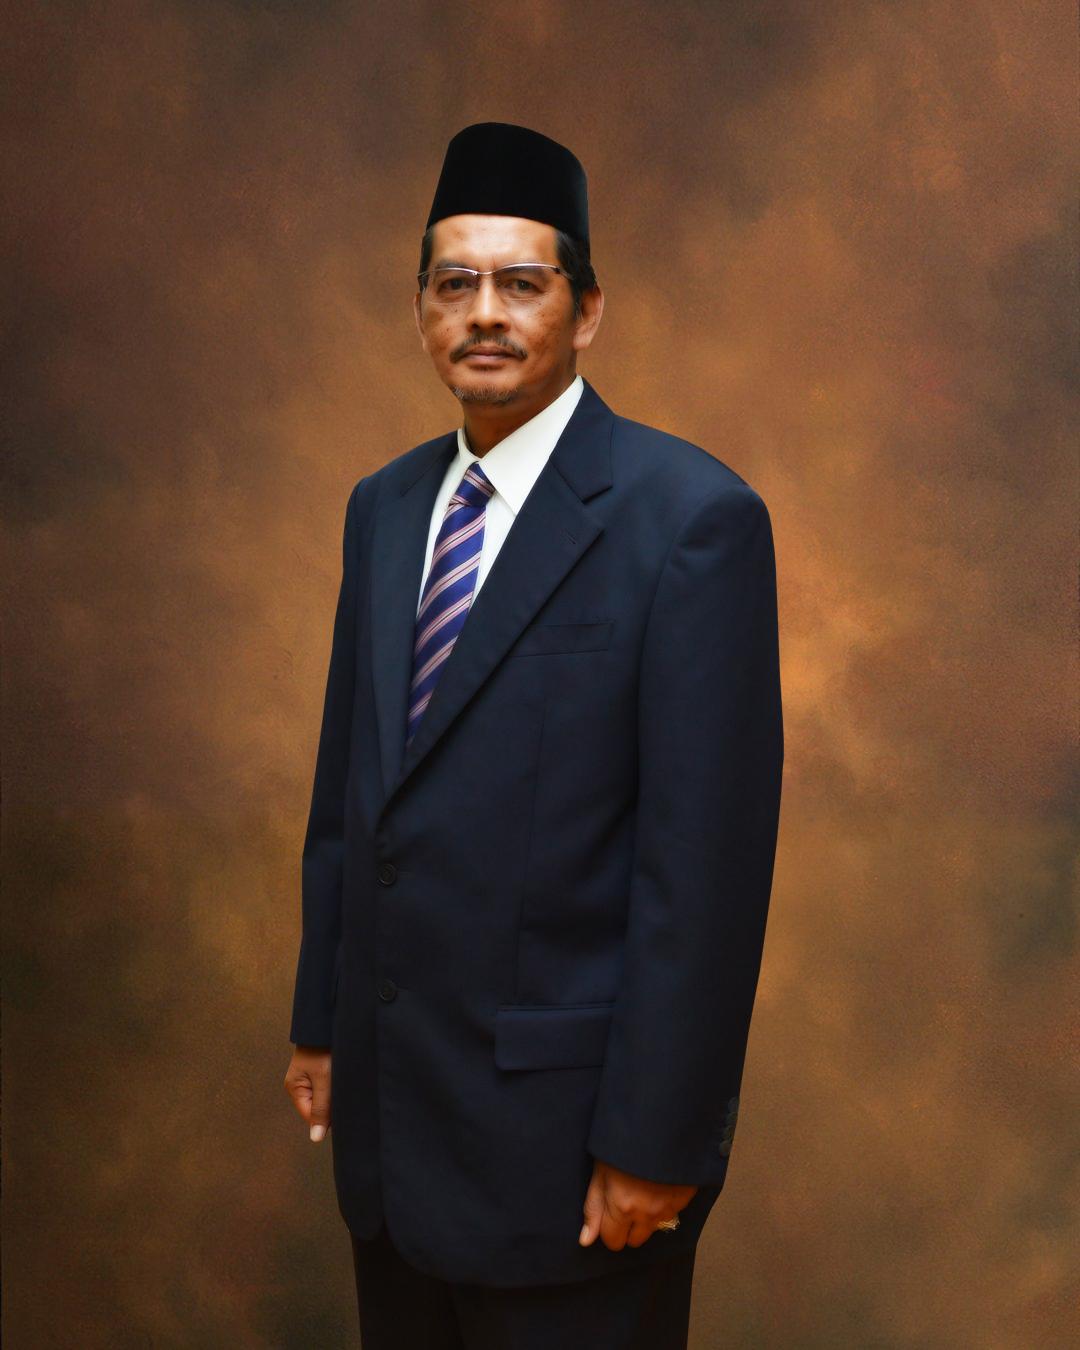 Azizulrahim bin Ahmad Zambri